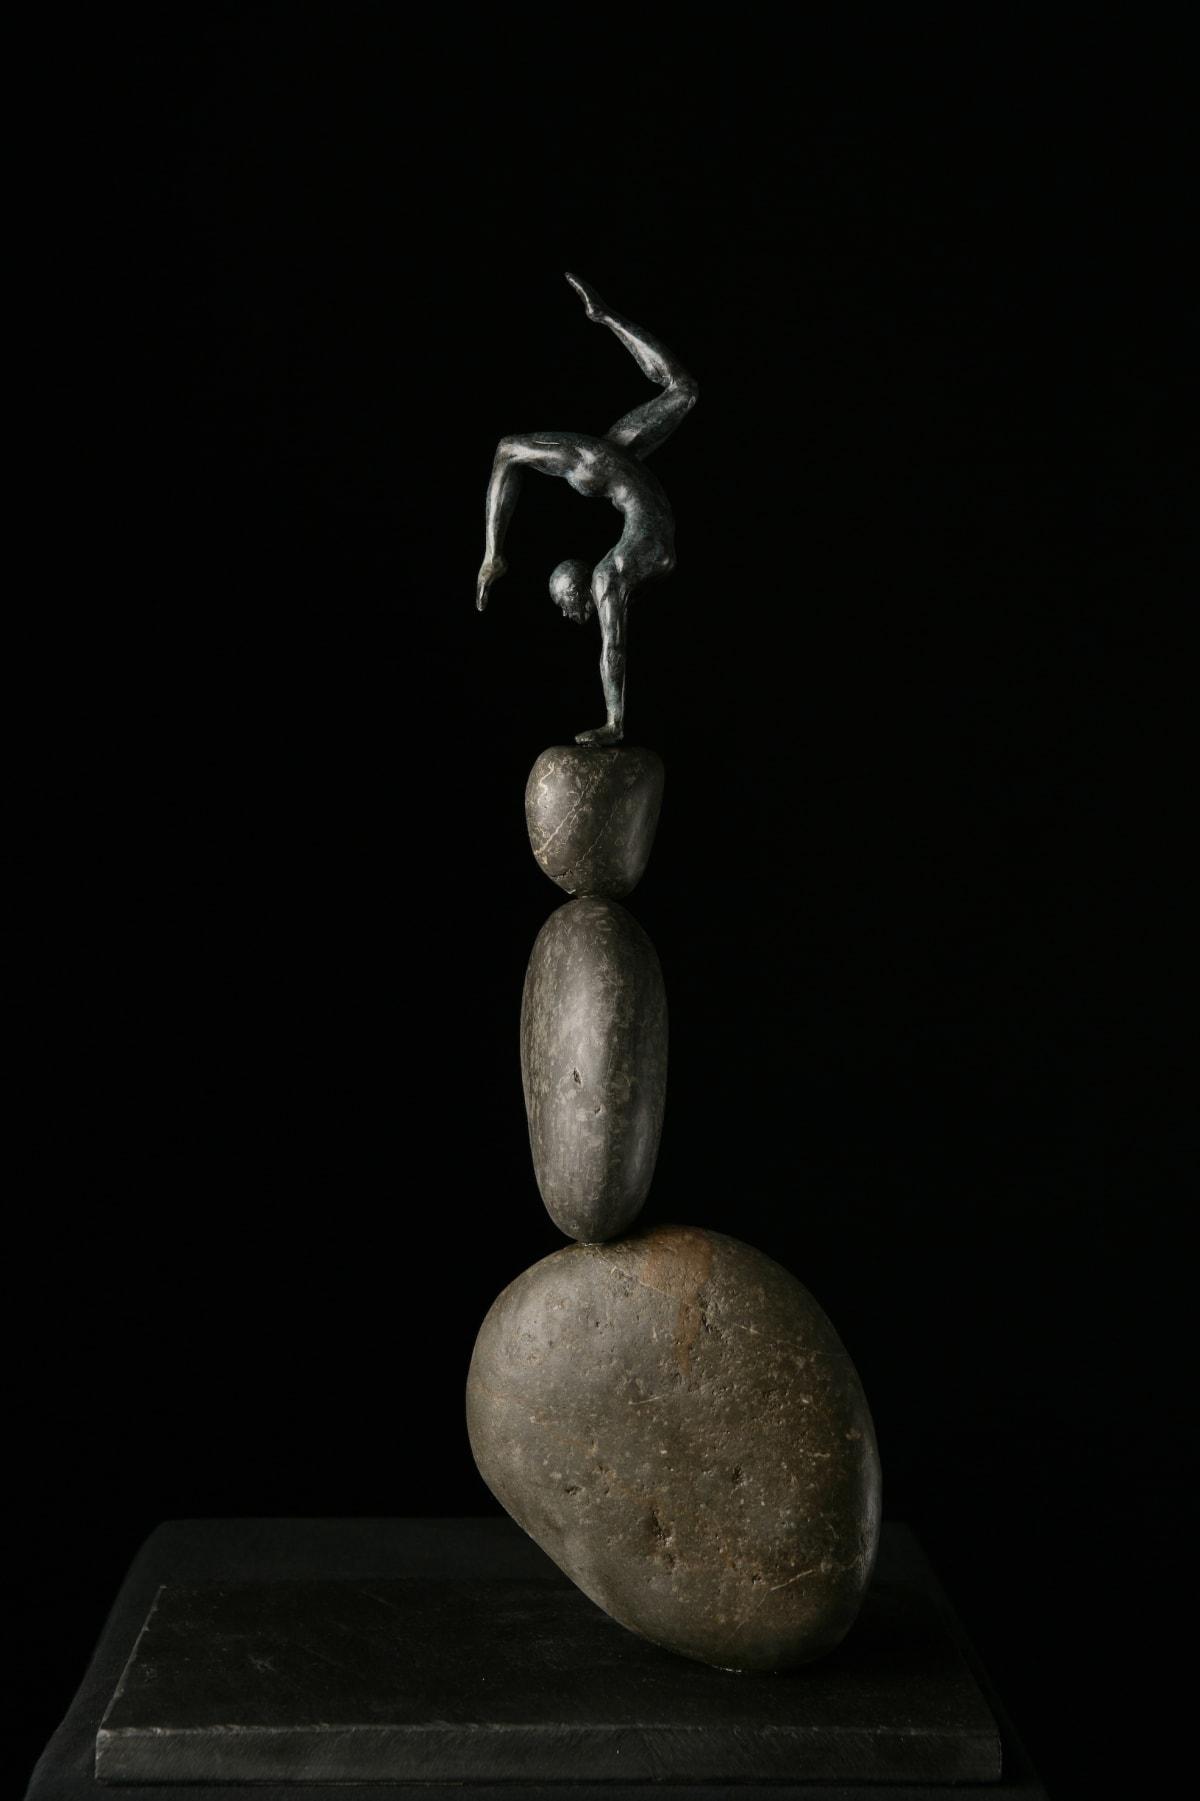 Brendon Murless Balance, 2019 Bronze Sculpture 54 x 30 x 18 cm 21 1/4 x 11 3/4 x 7 1/8 in Edition 6 of 8